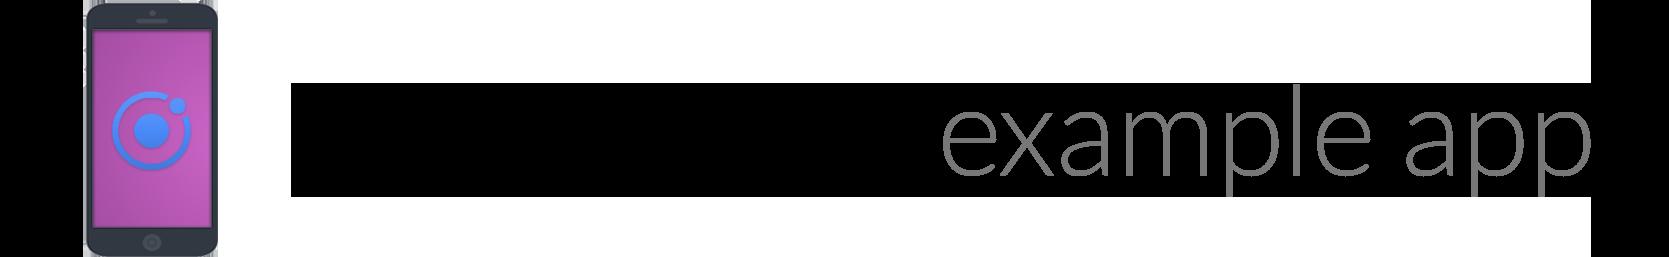 ionic-realworld-logo